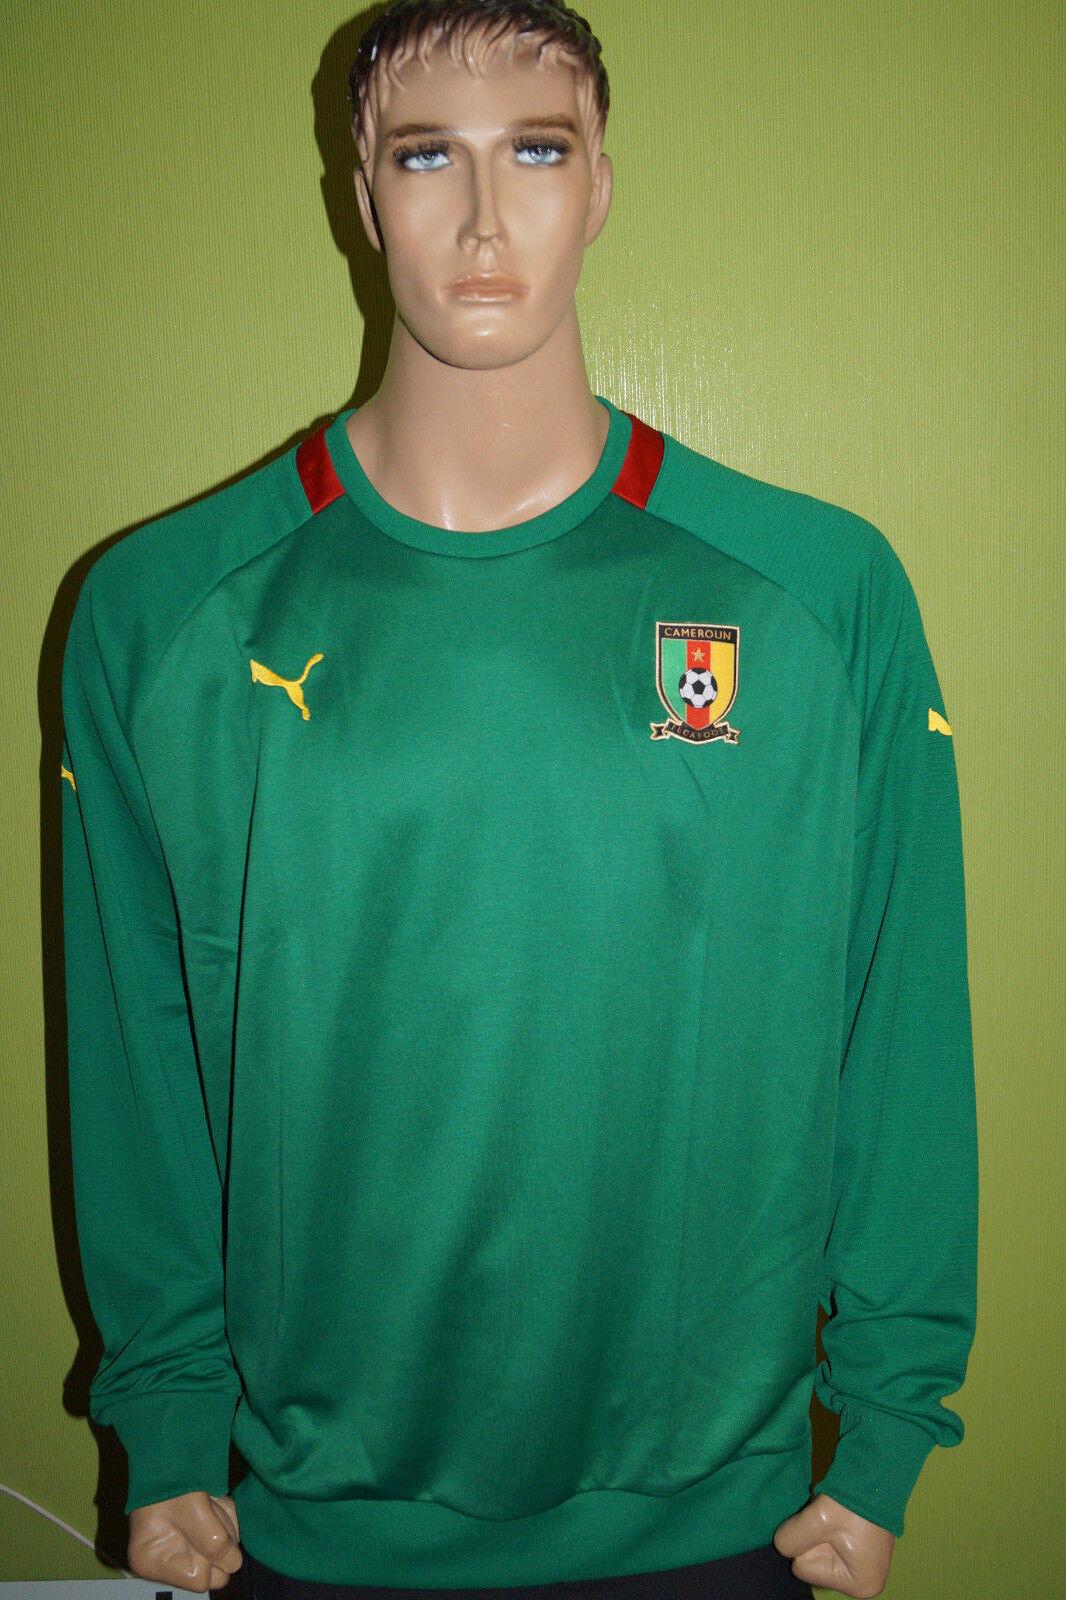 PUMA CAMEROON Kamerun Fussball Soccer Shirt M-L-XL-XXL